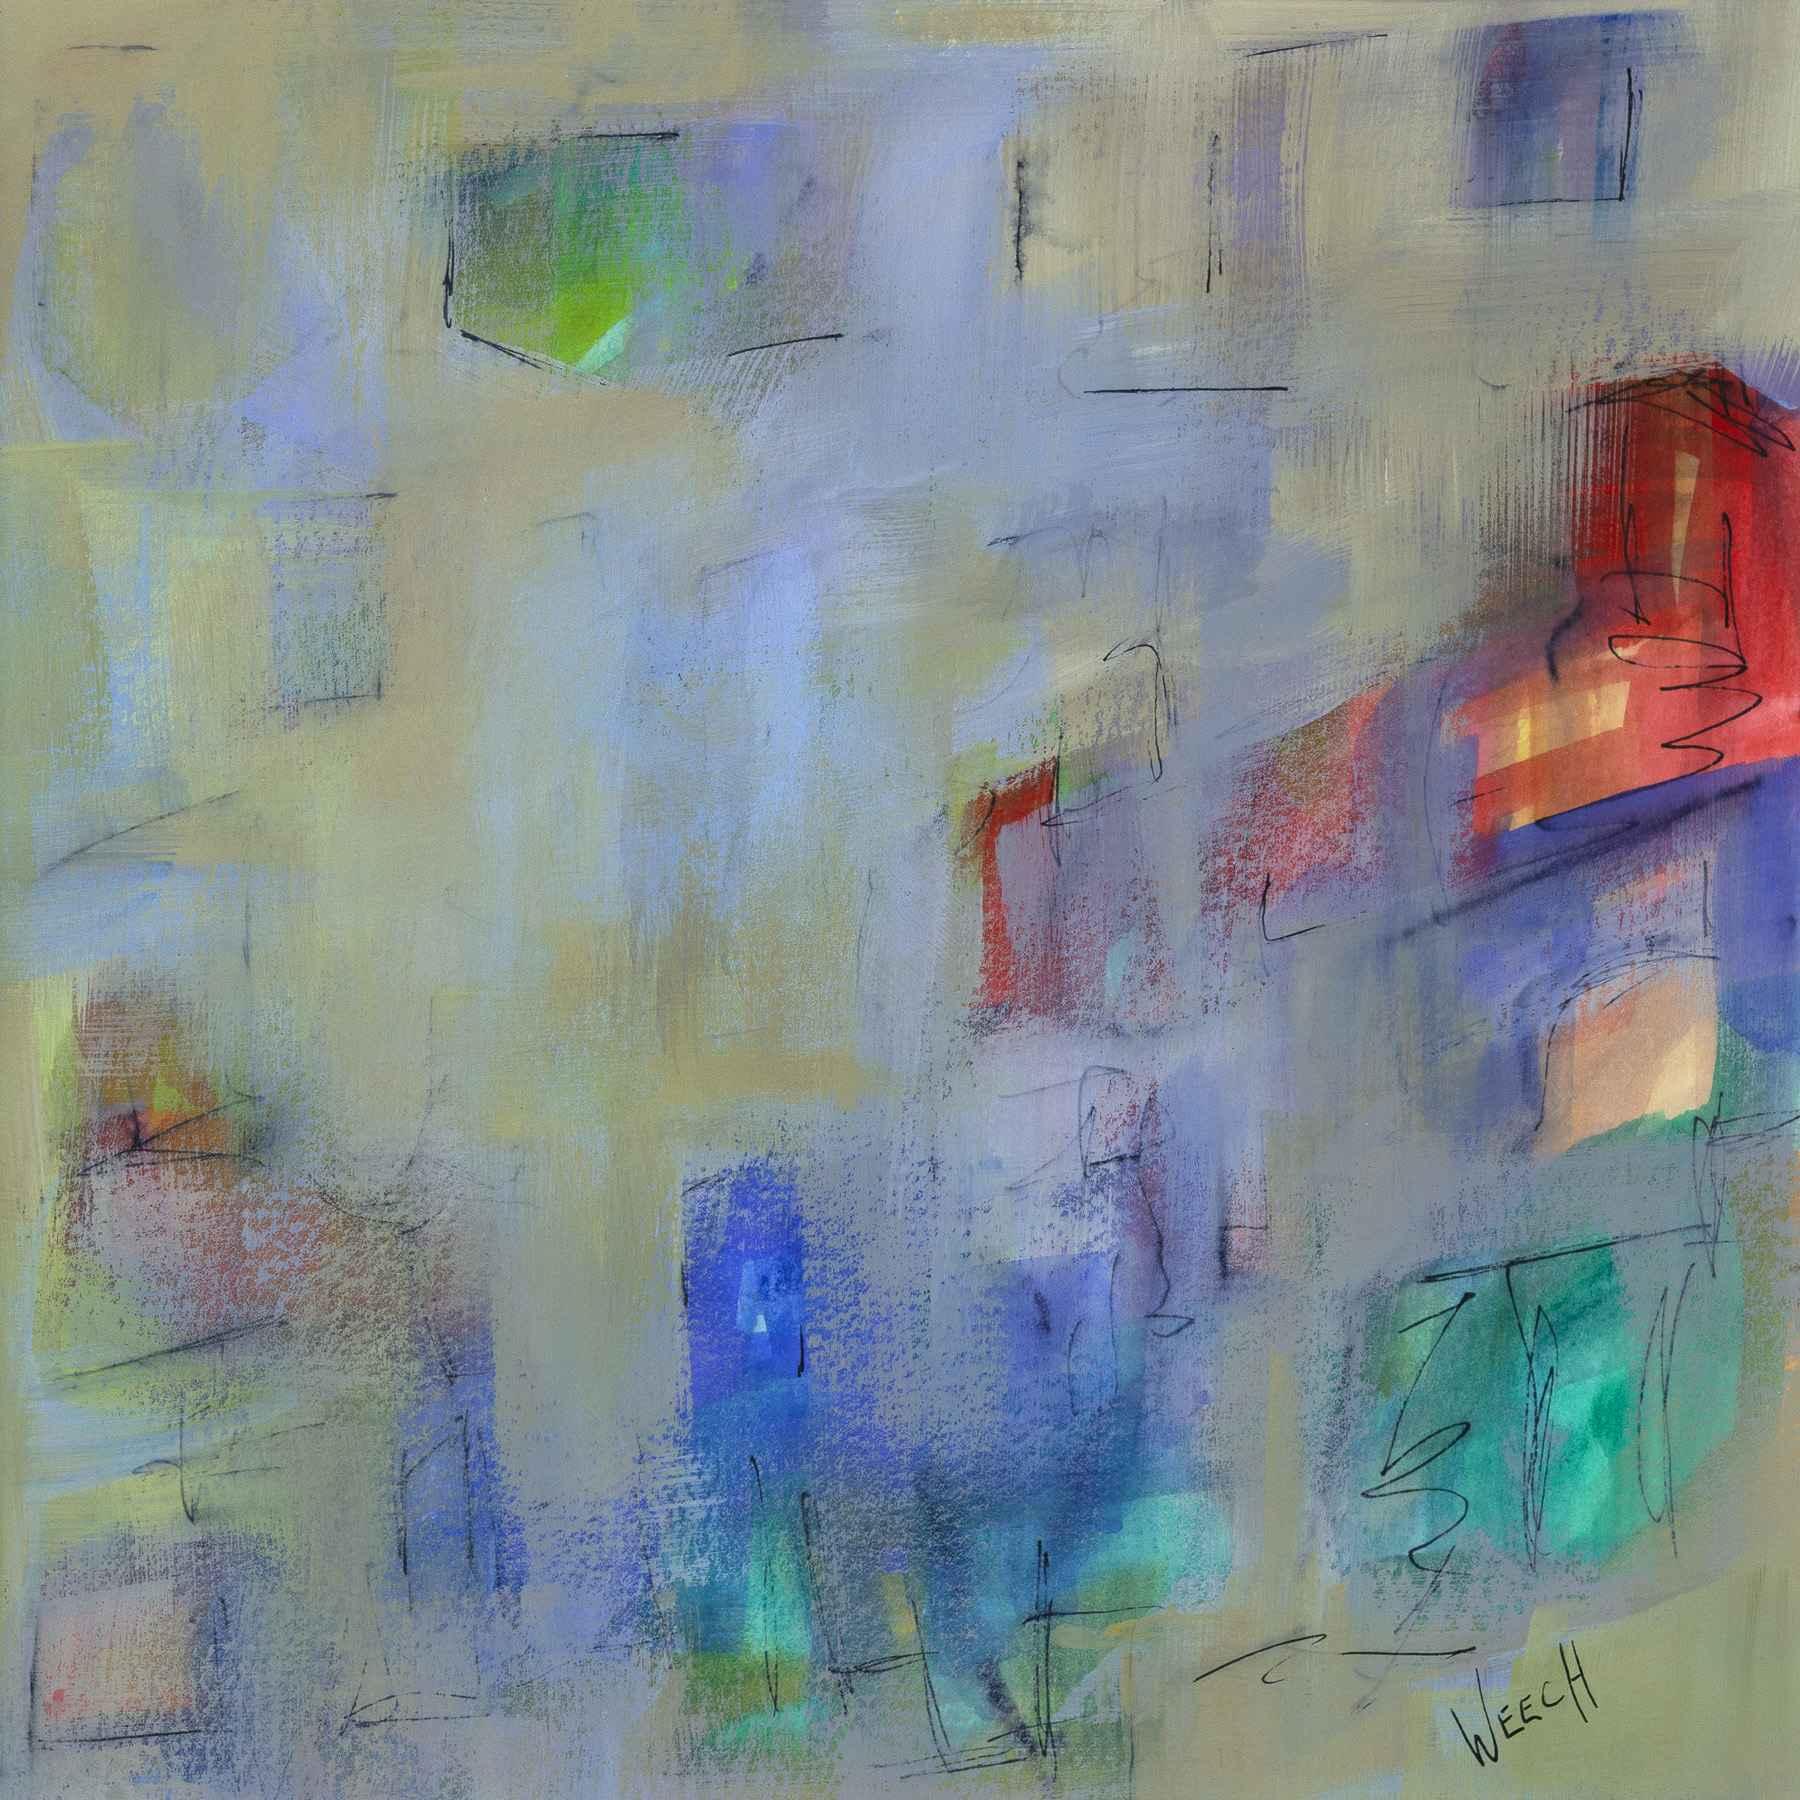 City Rhythm III by  Paula Weech - Masterpiece Online